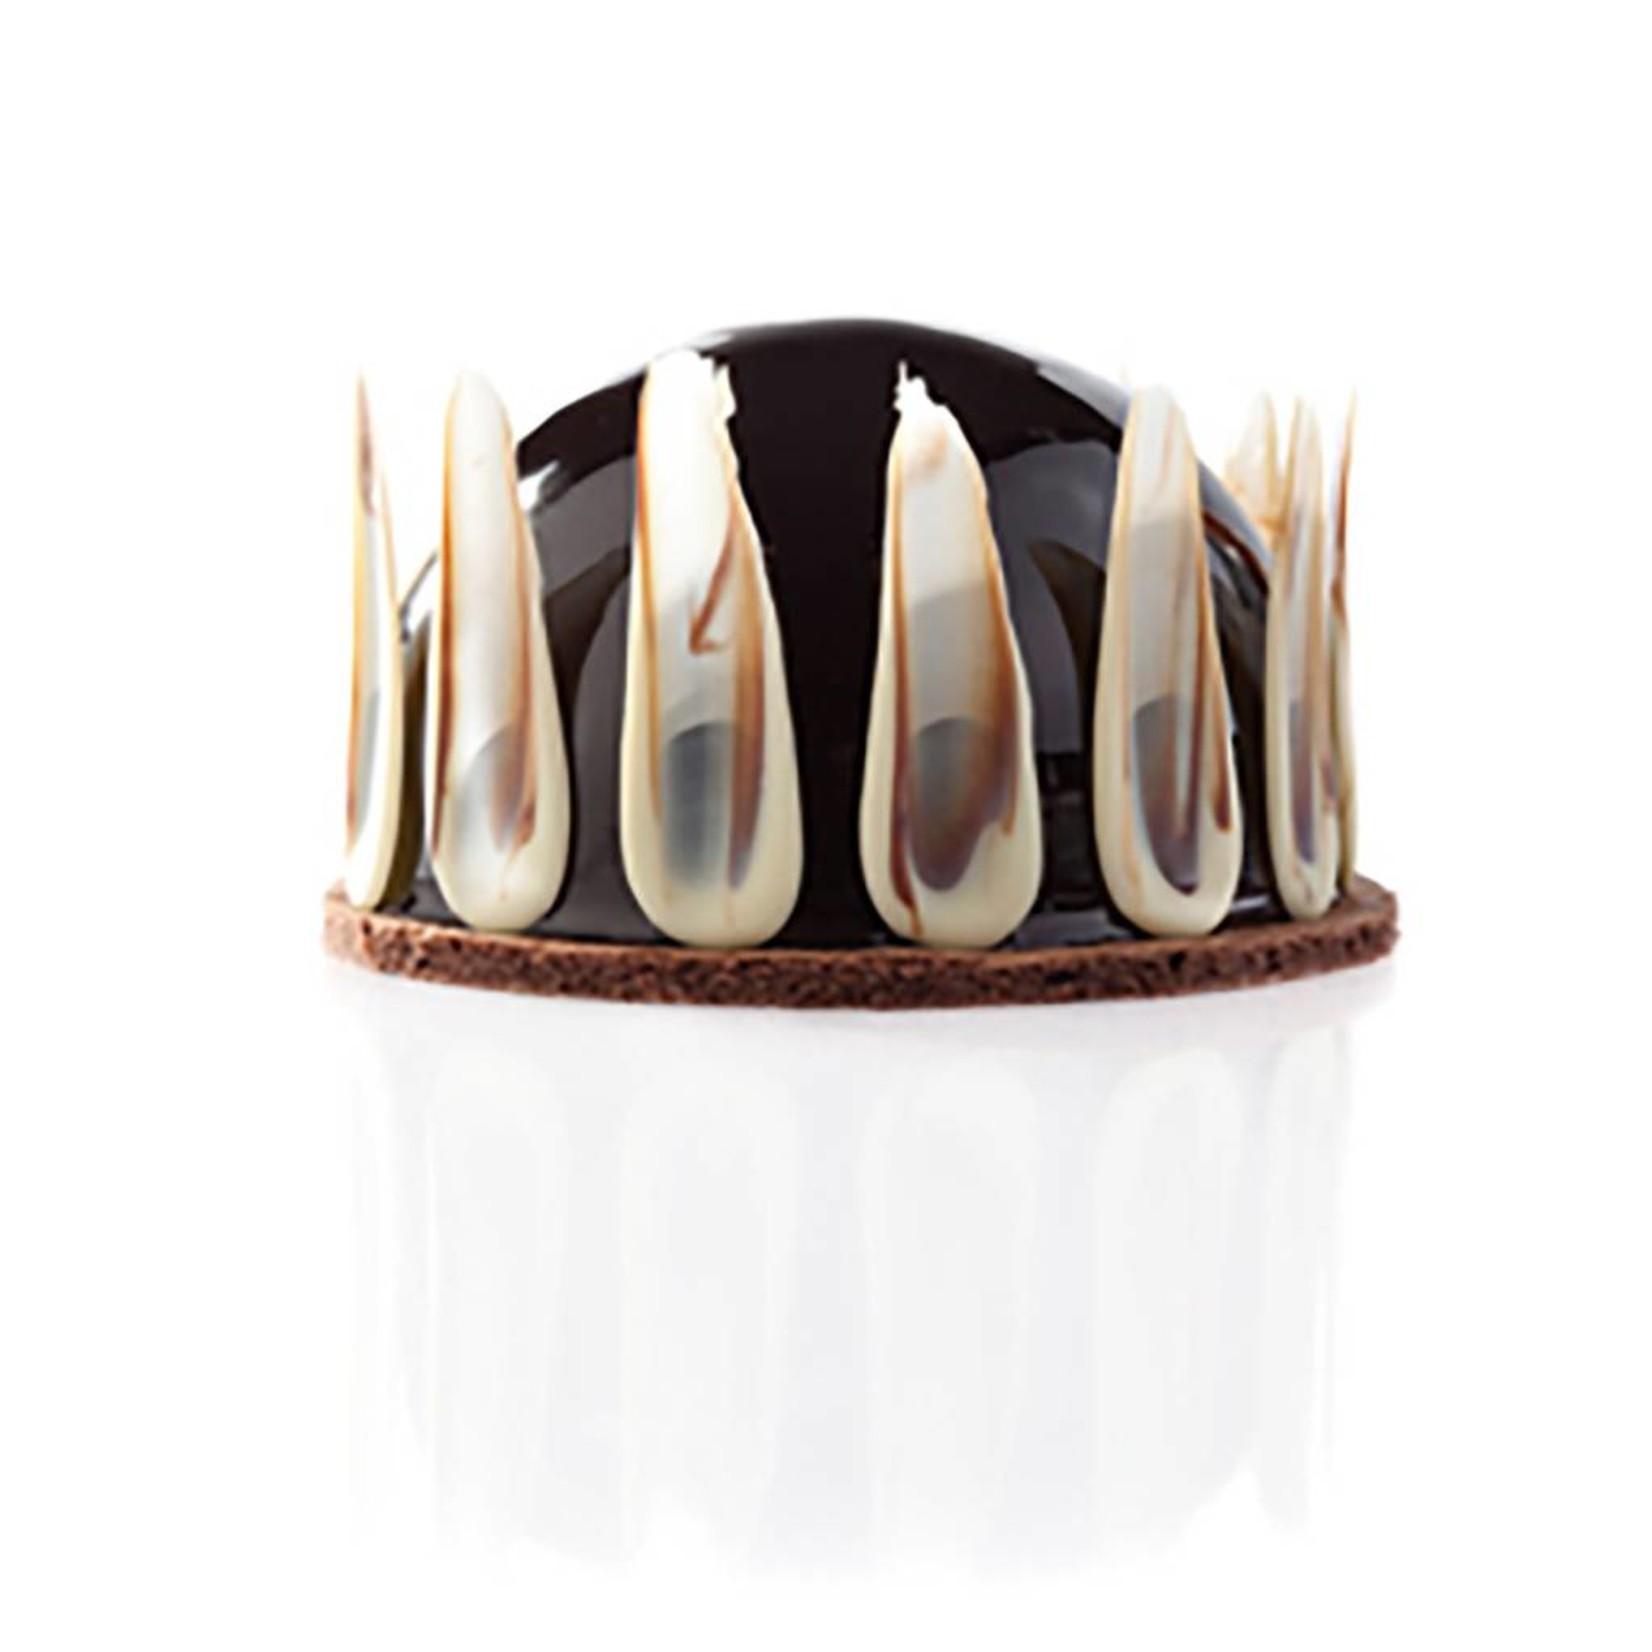 Dobla Dobla - Chocolate Feather Artisanal (126ct), 91250 | 77102